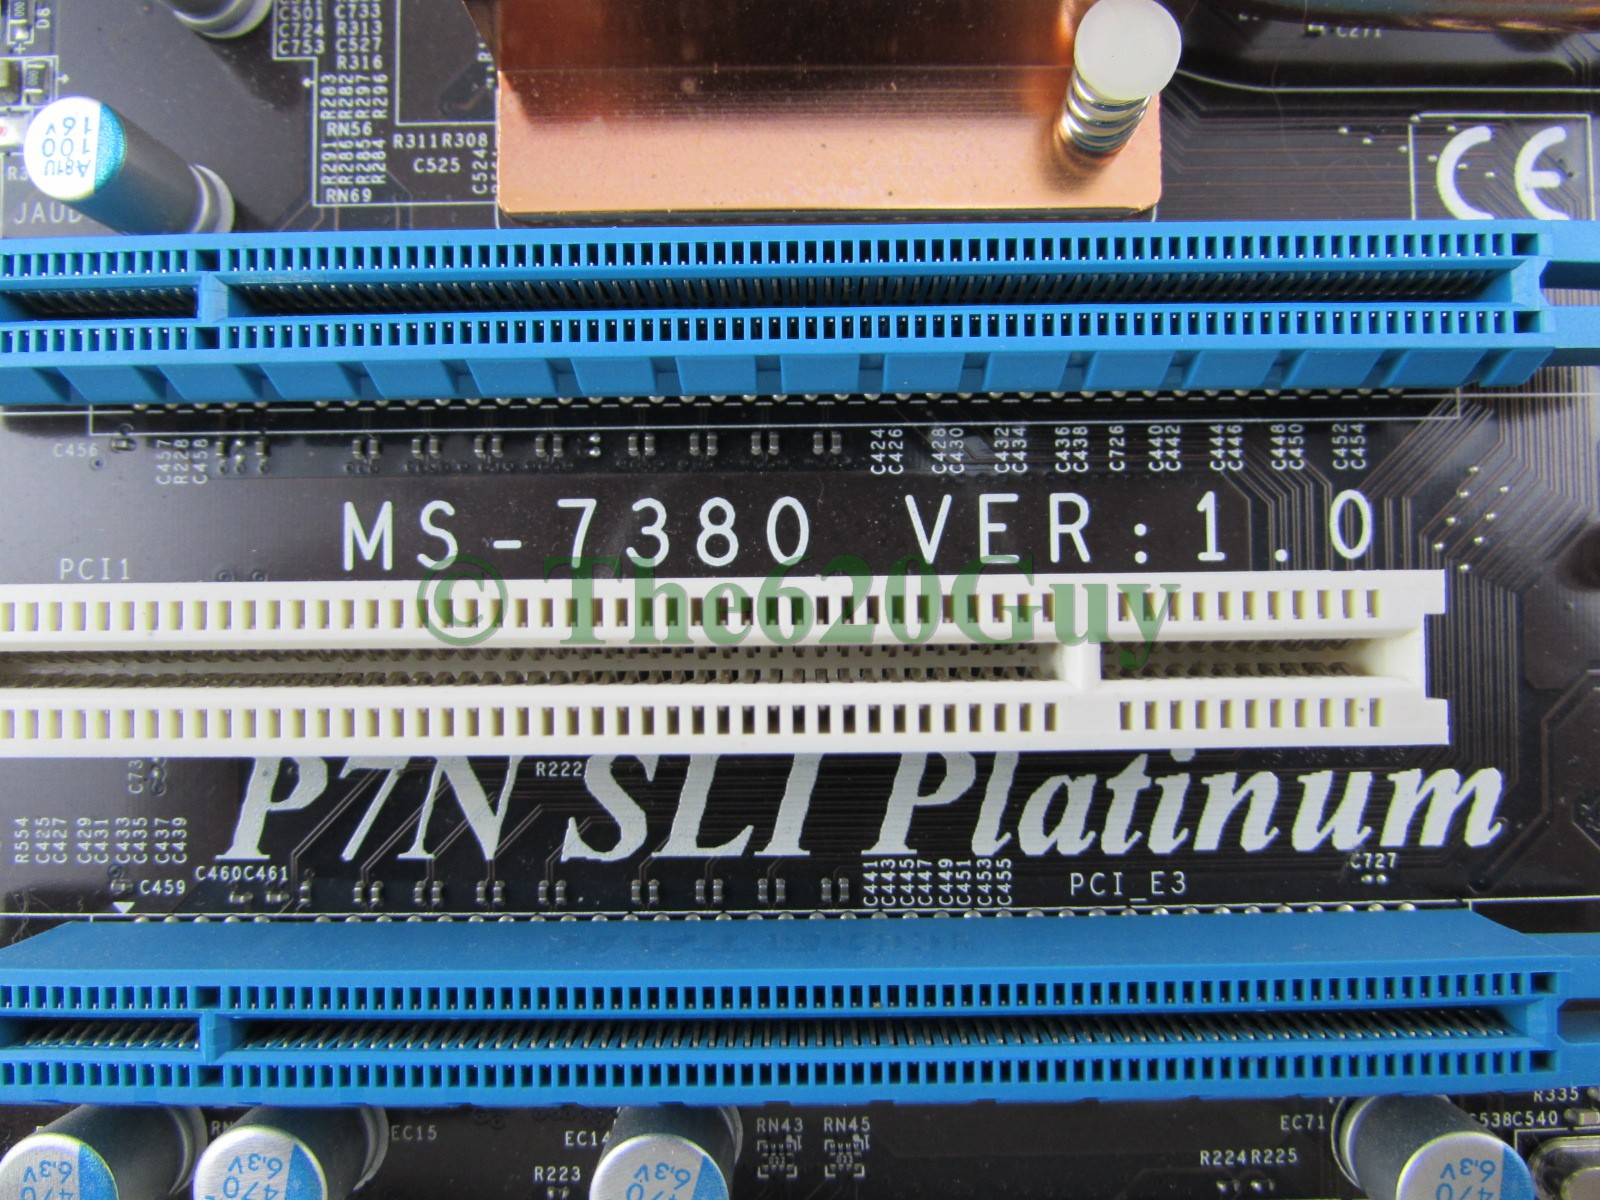 Msi P7n Sli Platinum Drivers Download | wathstone